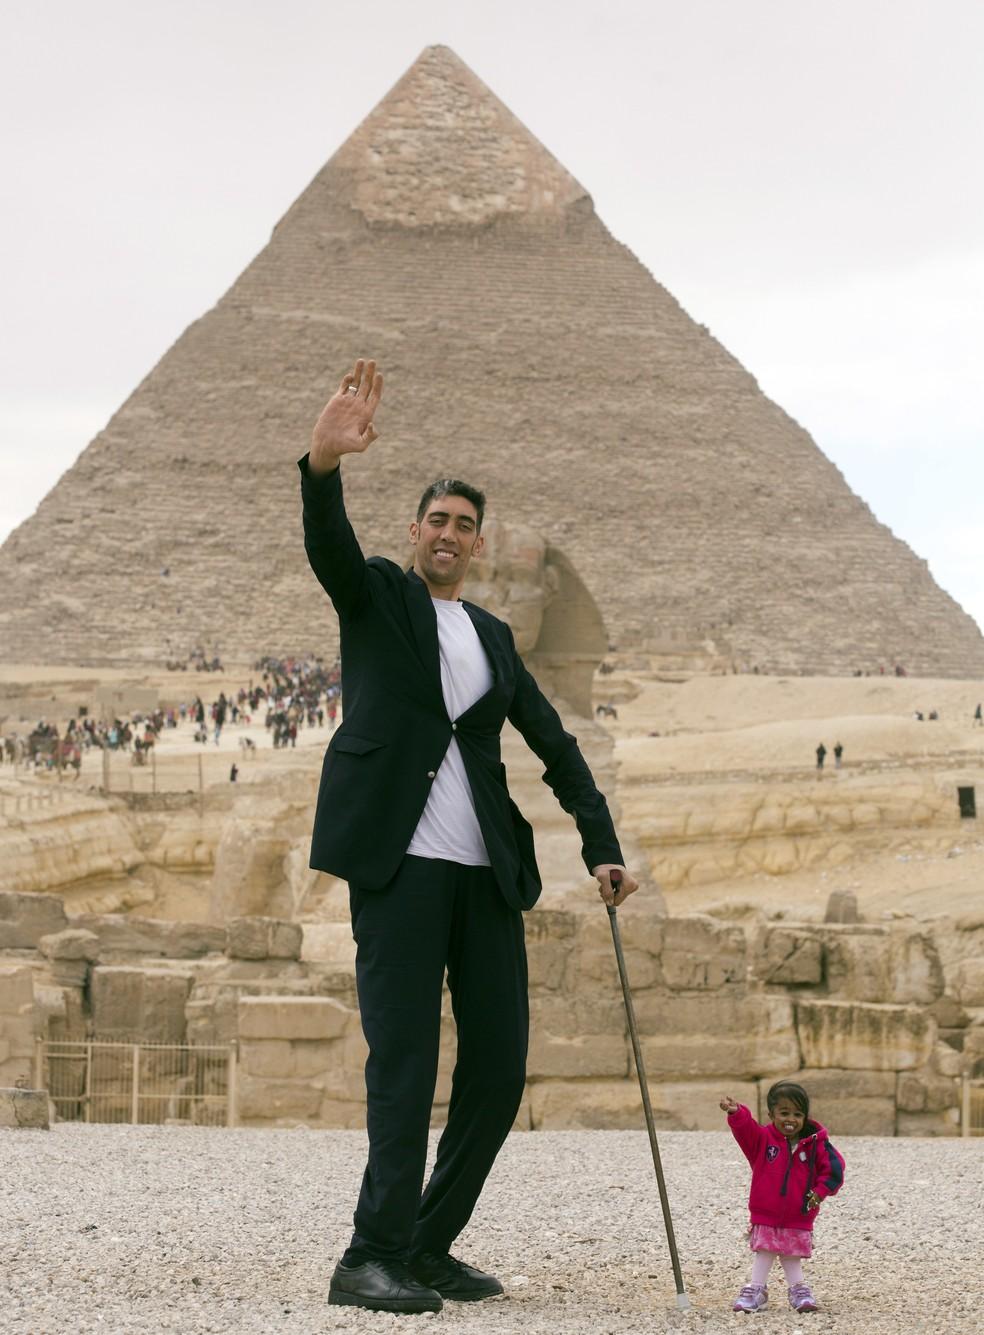 Sultan Kosen e Jyoti Amge em frente Ai??s pirA?mides do Egito (Foto: Amr Nabil/AP Photo)